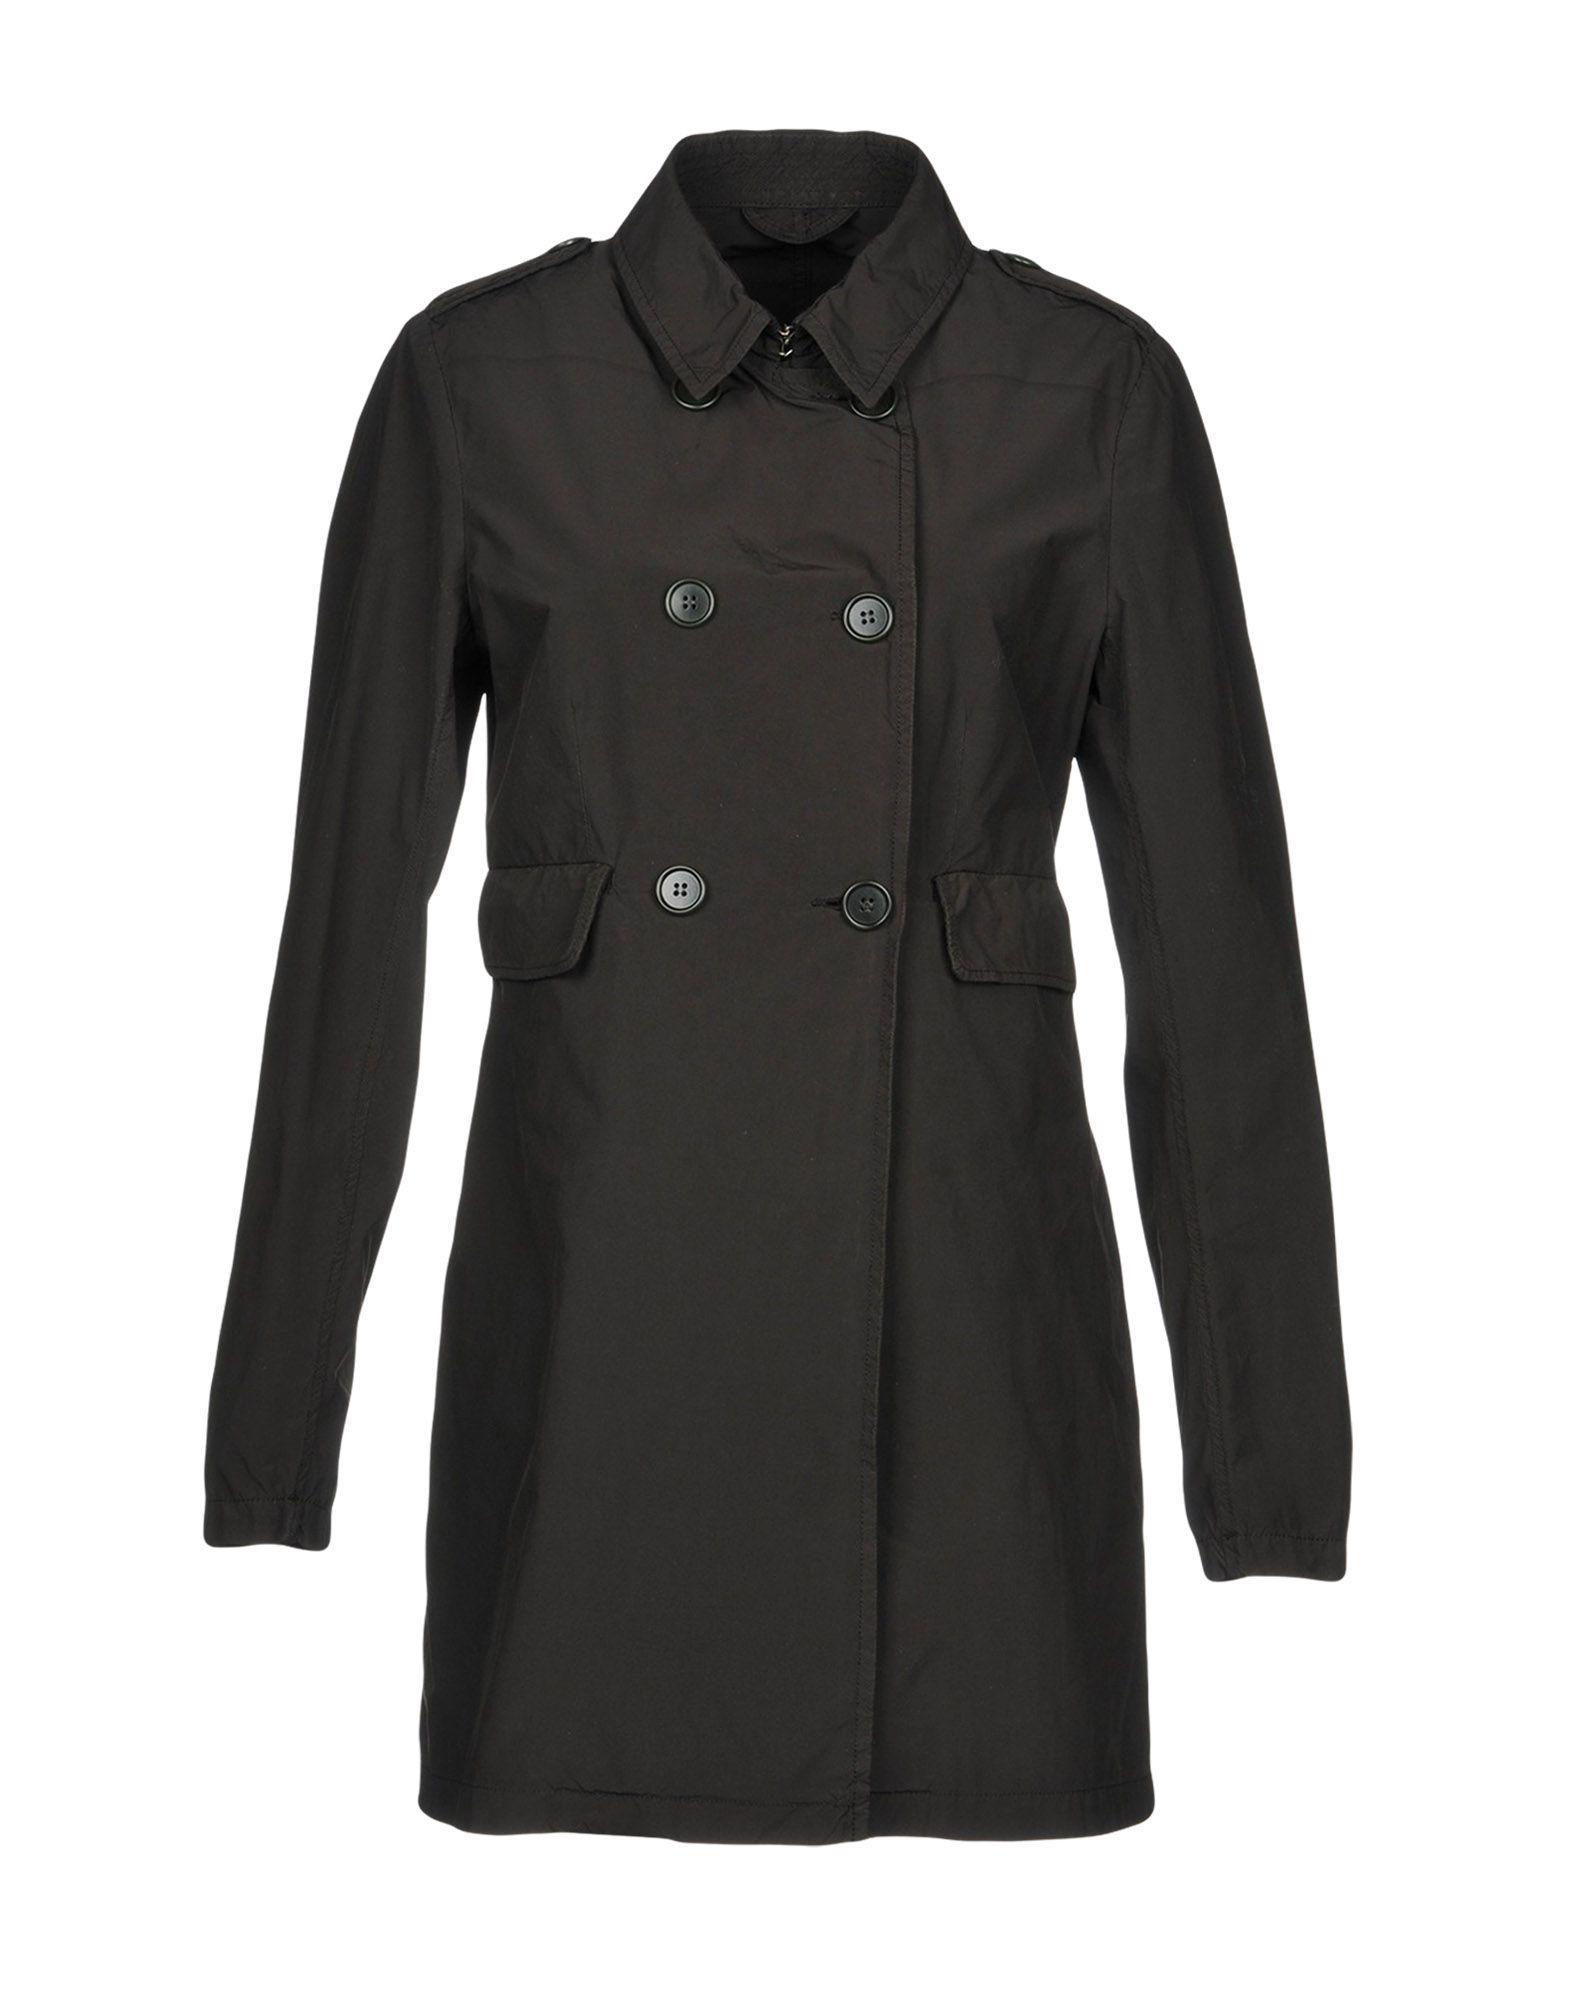 Aspesi Double Breasted Pea Coat In Black